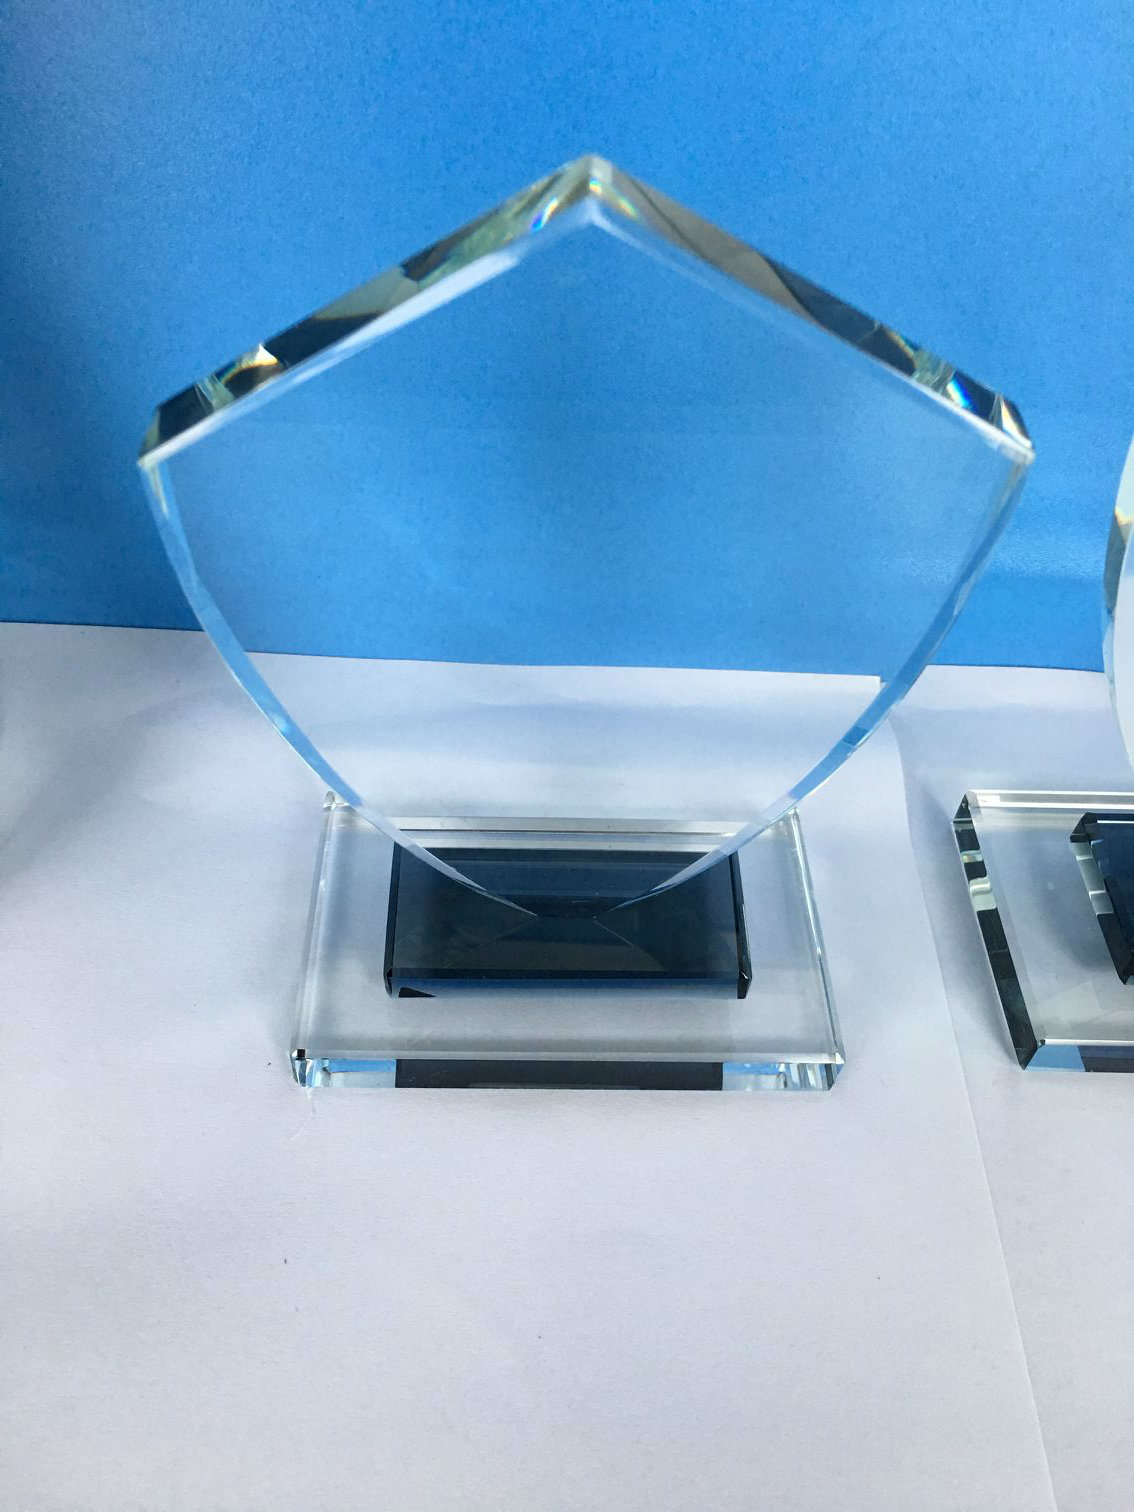 Fwgt-01 Jude Glass Trophy